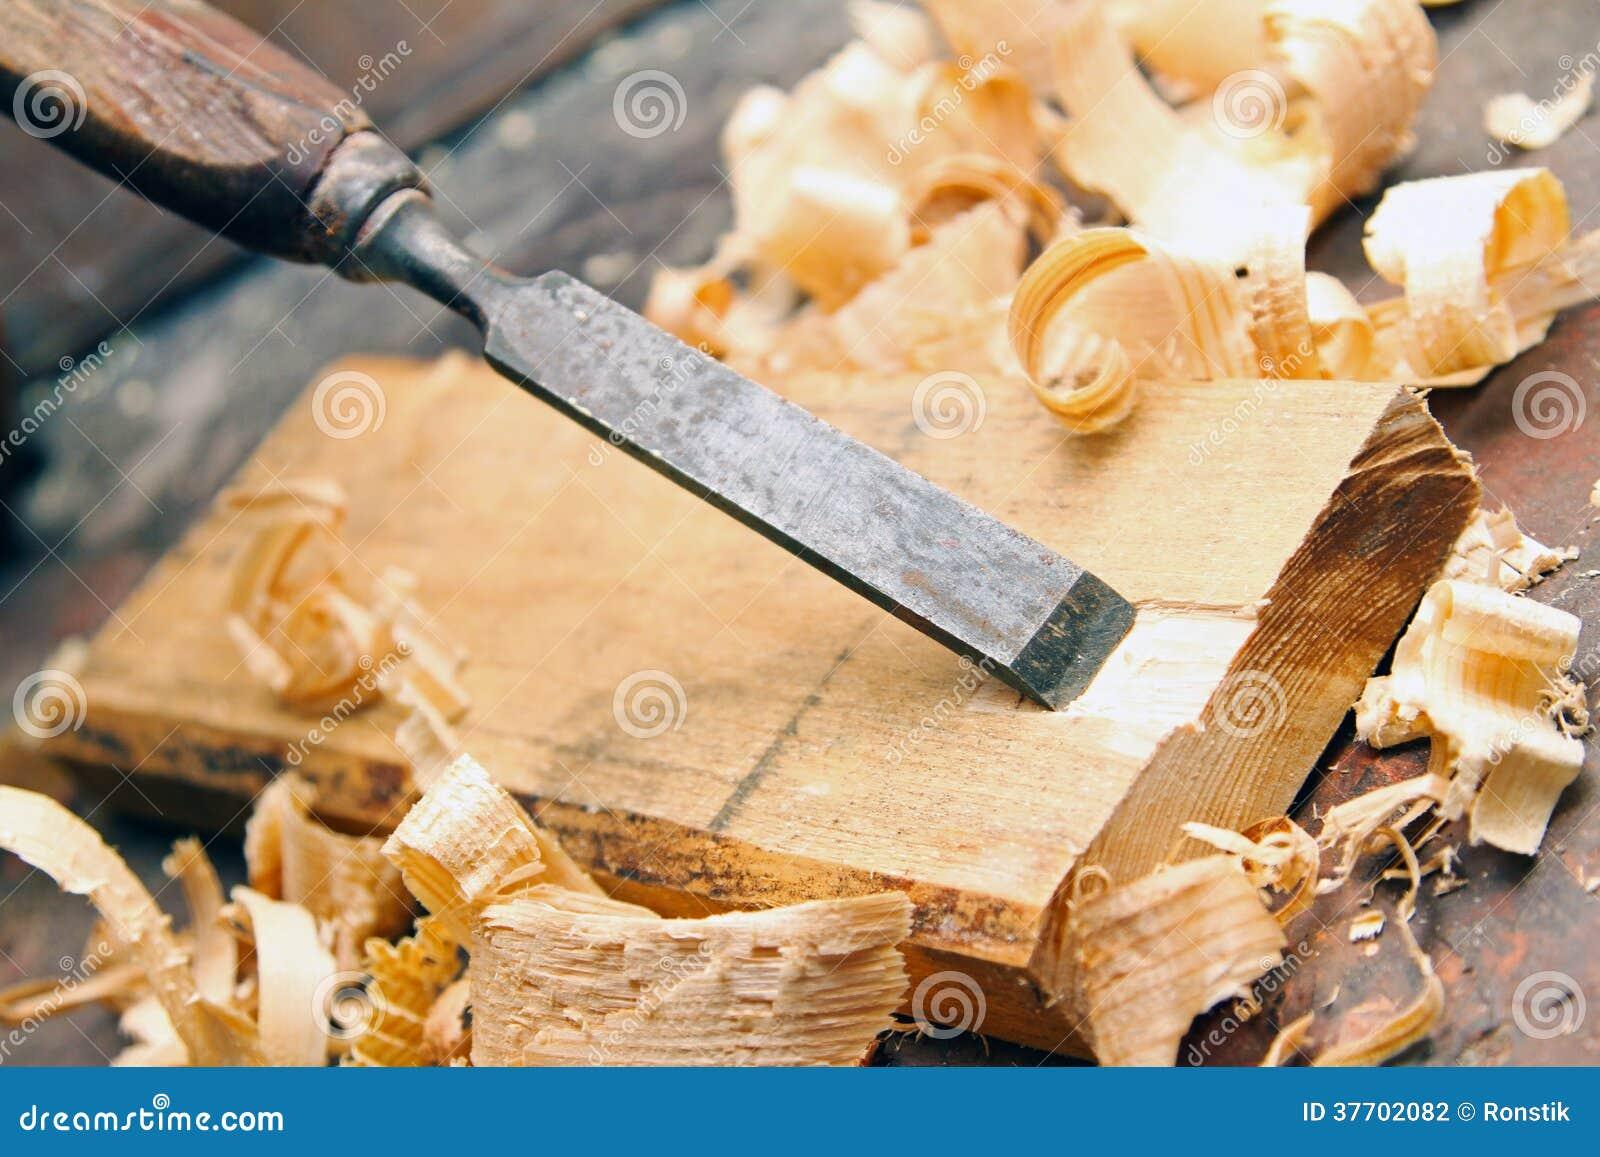 Wood Chisel - Vintage Carpentry Woodworking Workshop Stock Photography ...